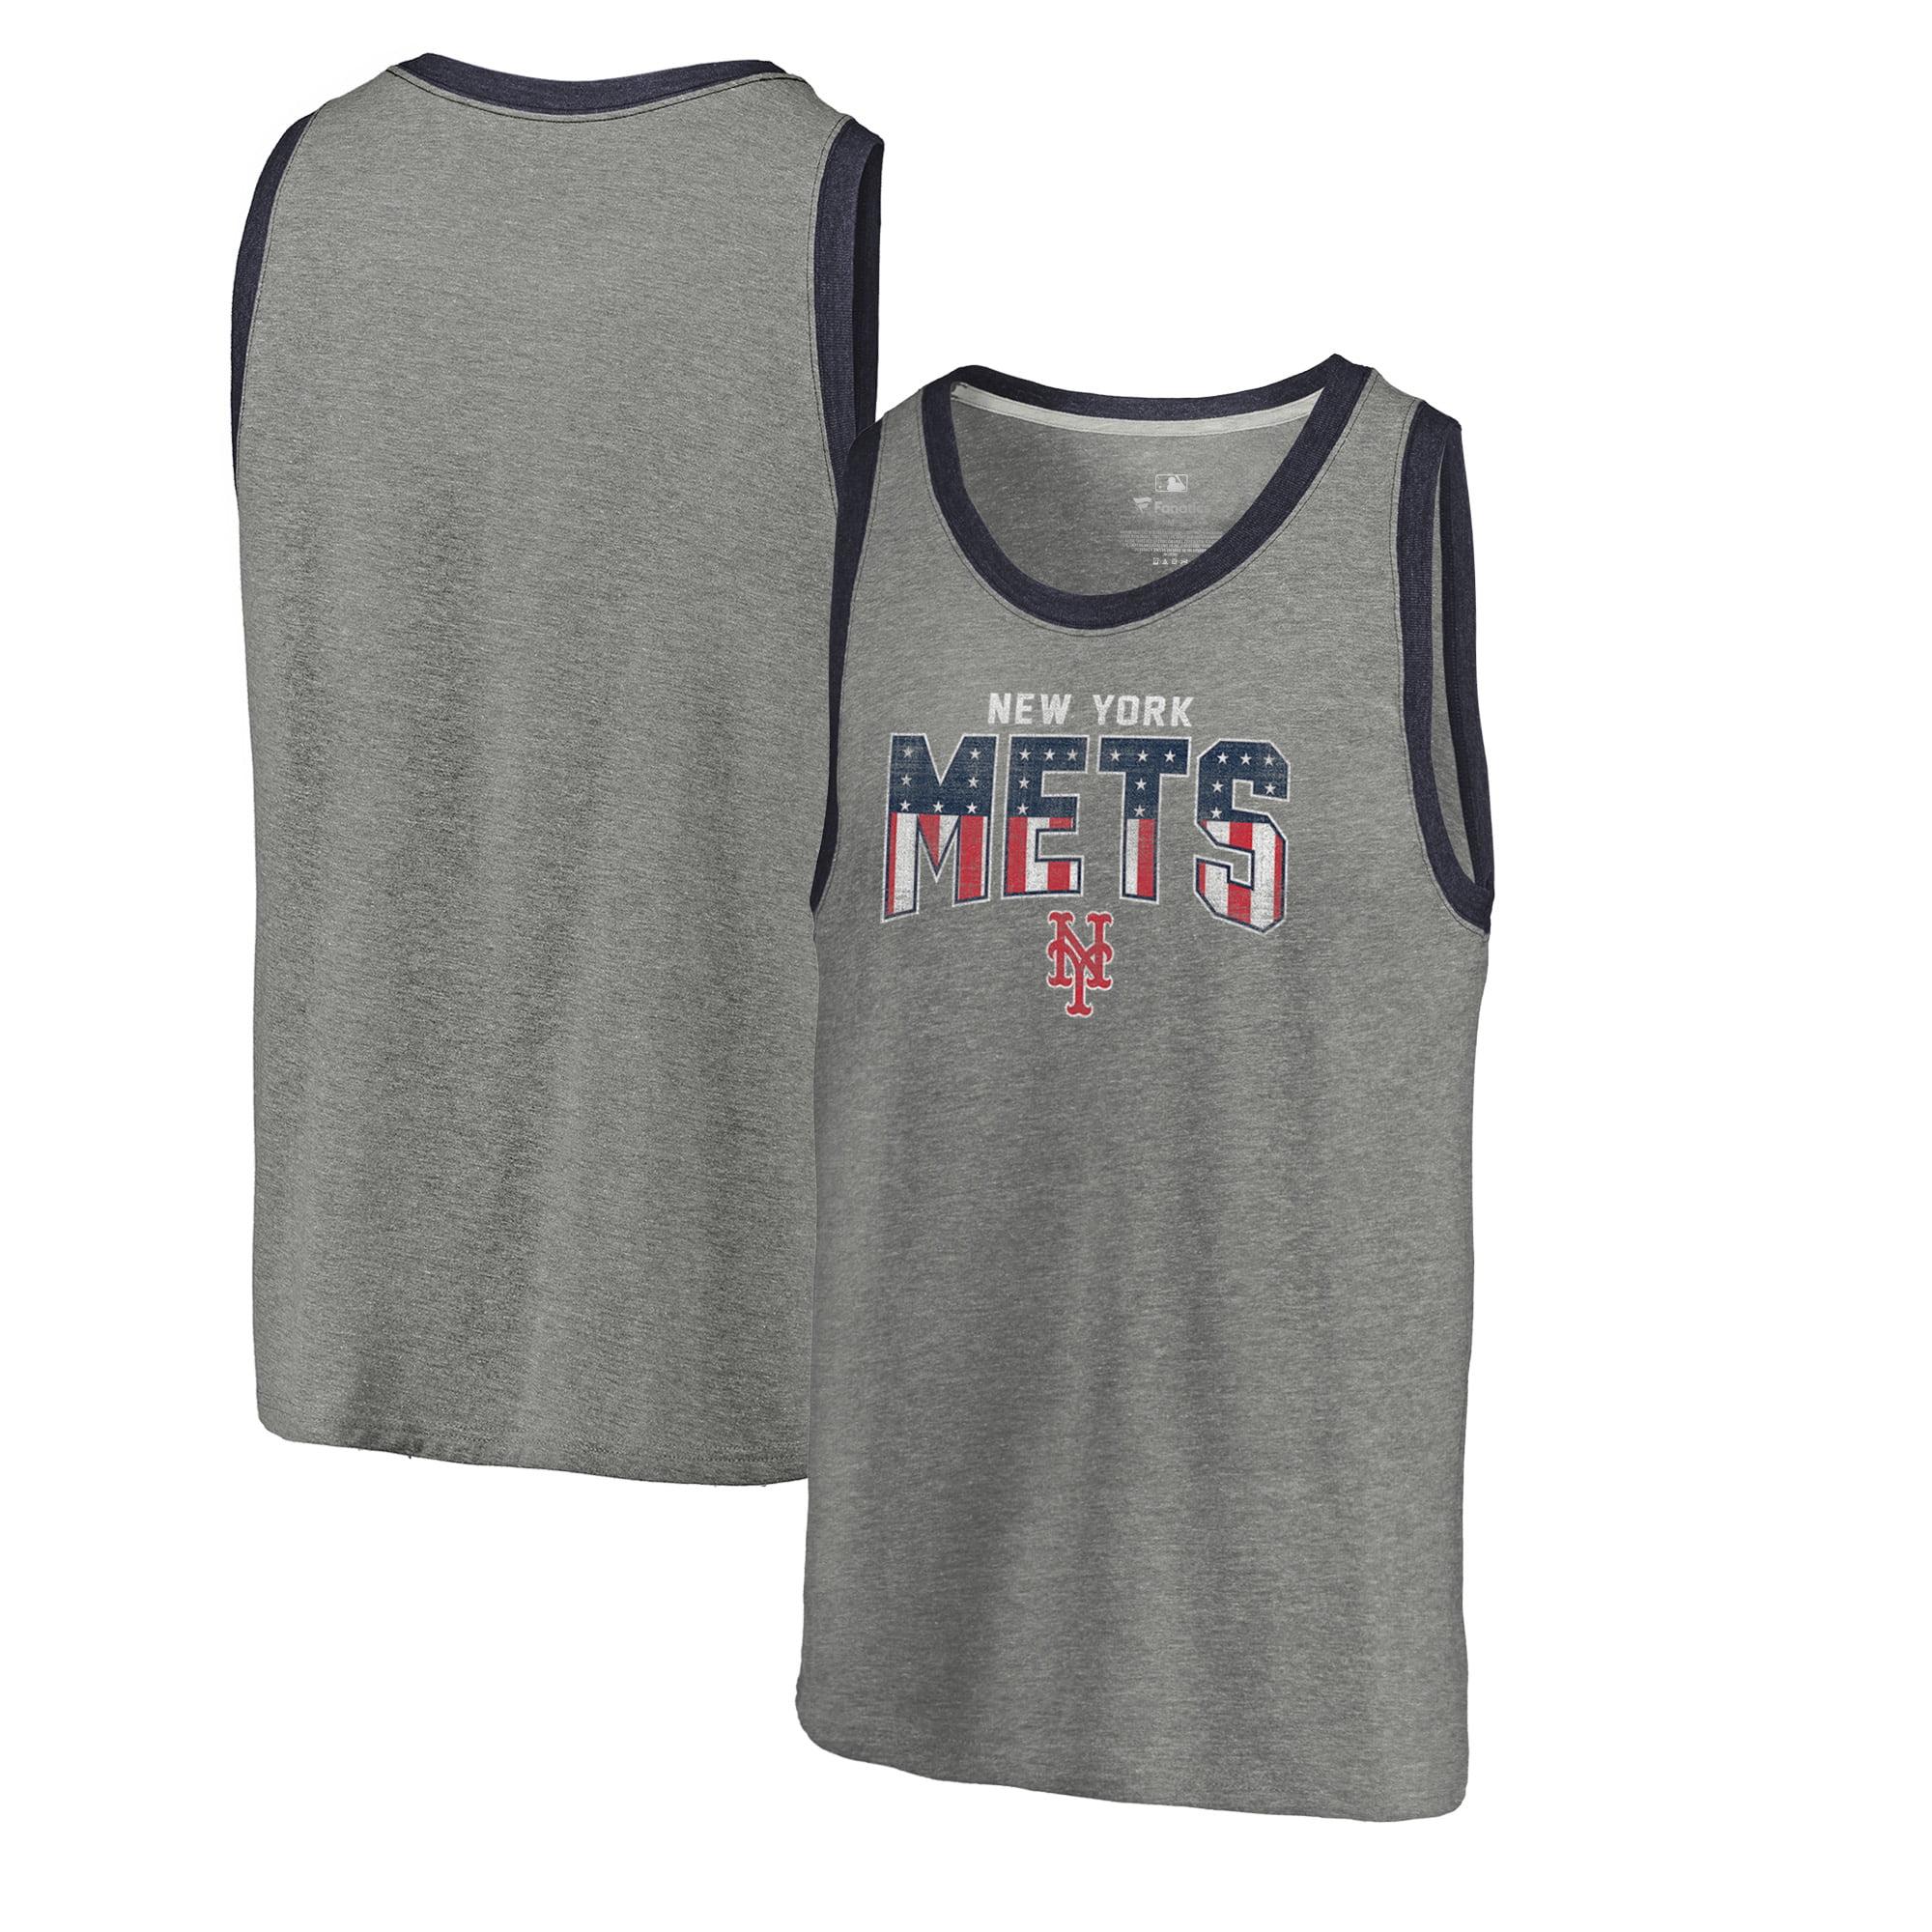 New York Mets Fanatics Branded Freedom Tri-Blend Tank Top - Heathered Gray